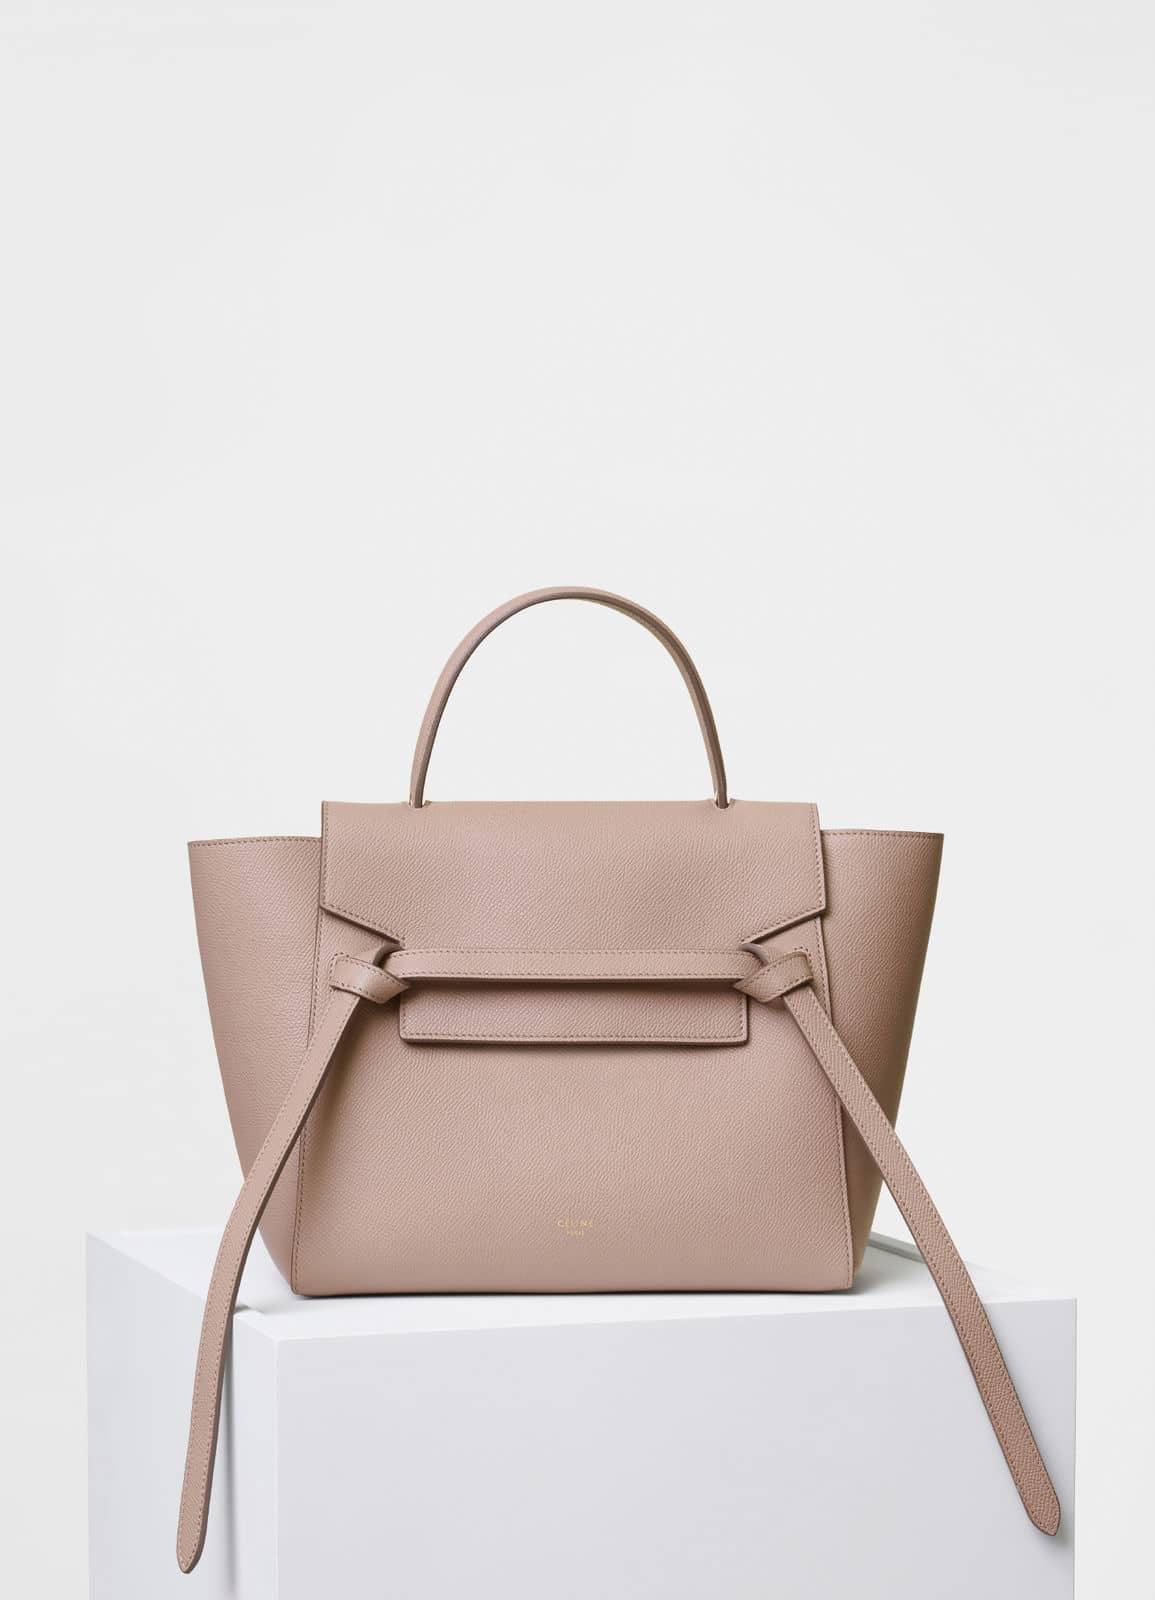 Celine Mini Belt Bag In Light Taupe Grained Calfskin.CELINE Grained ... 0a1a7e5c01022